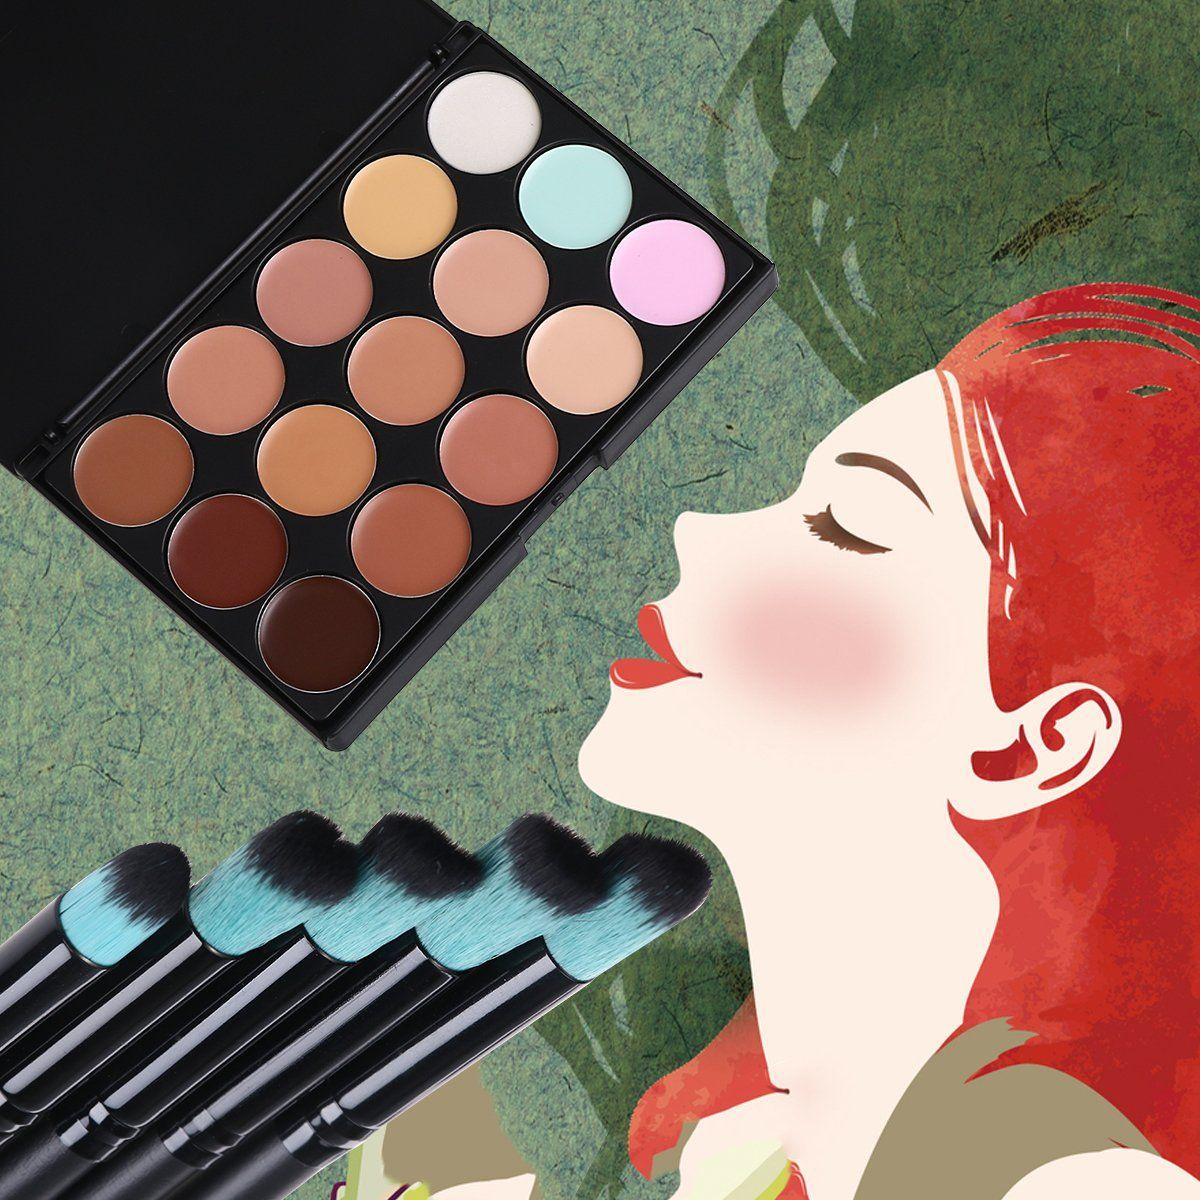 Tinksky Contour Face Cream Makeup Palette with 10pcs